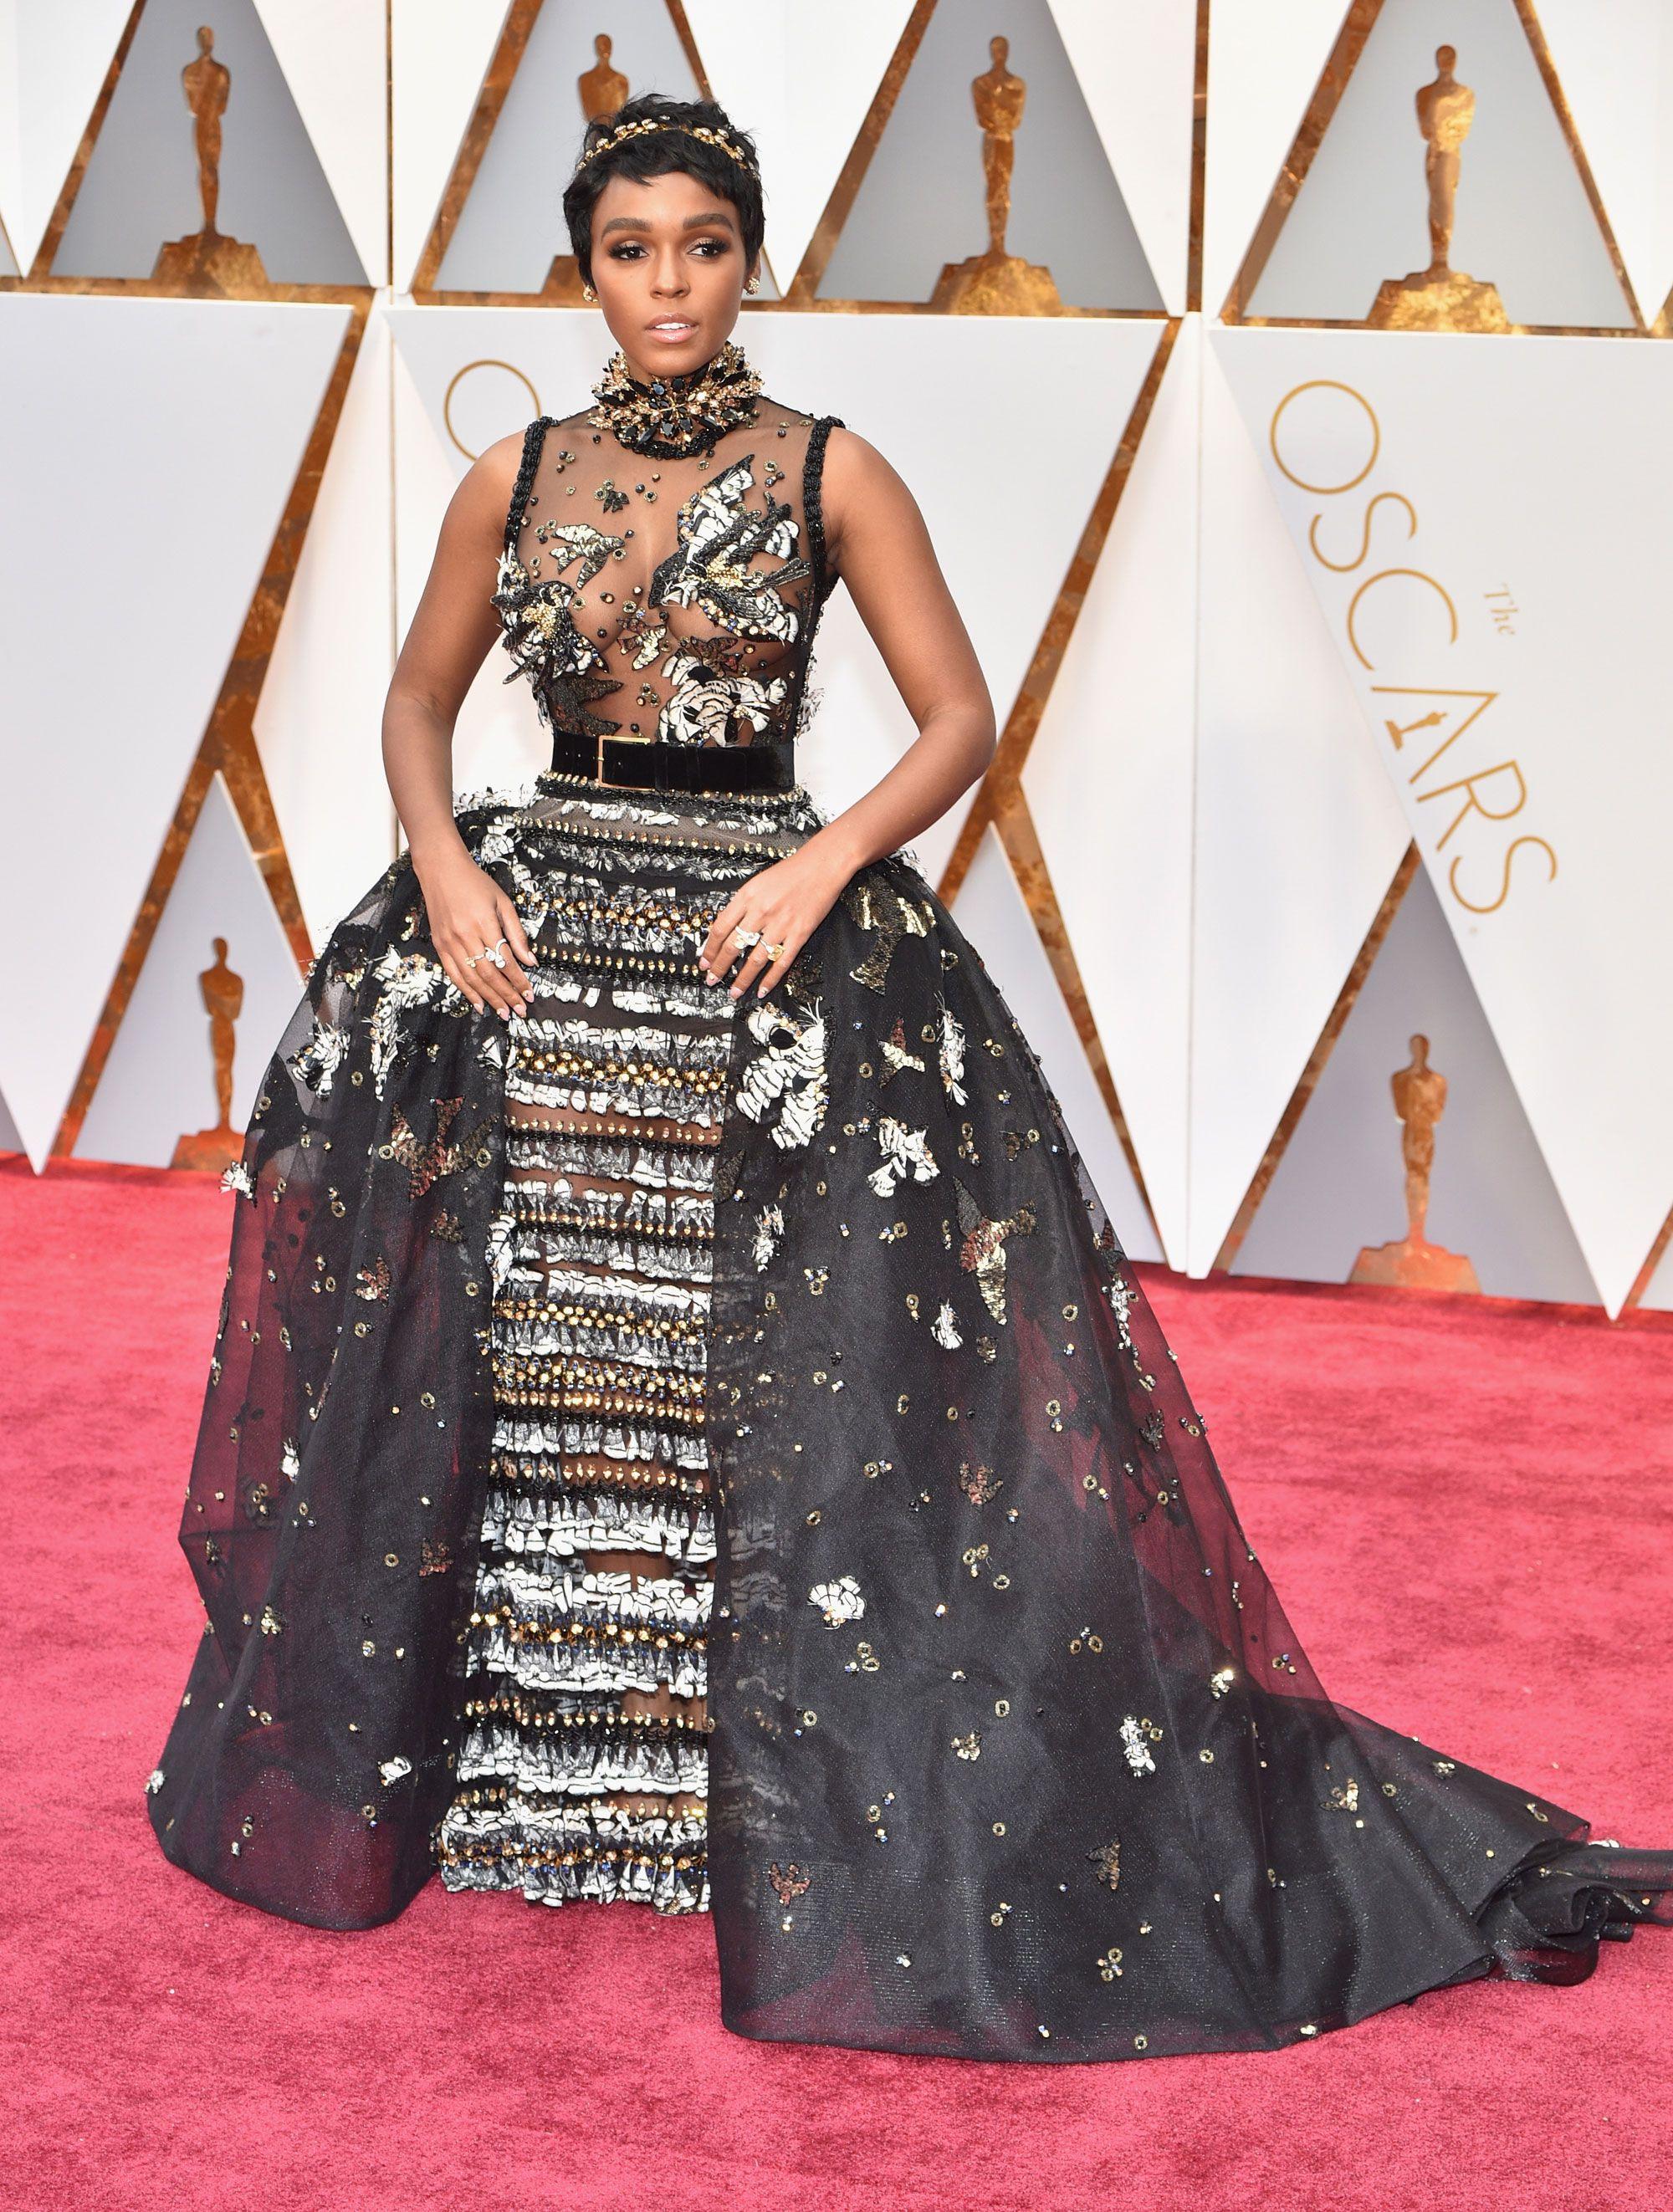 Janelle Monae Dress on Oscar